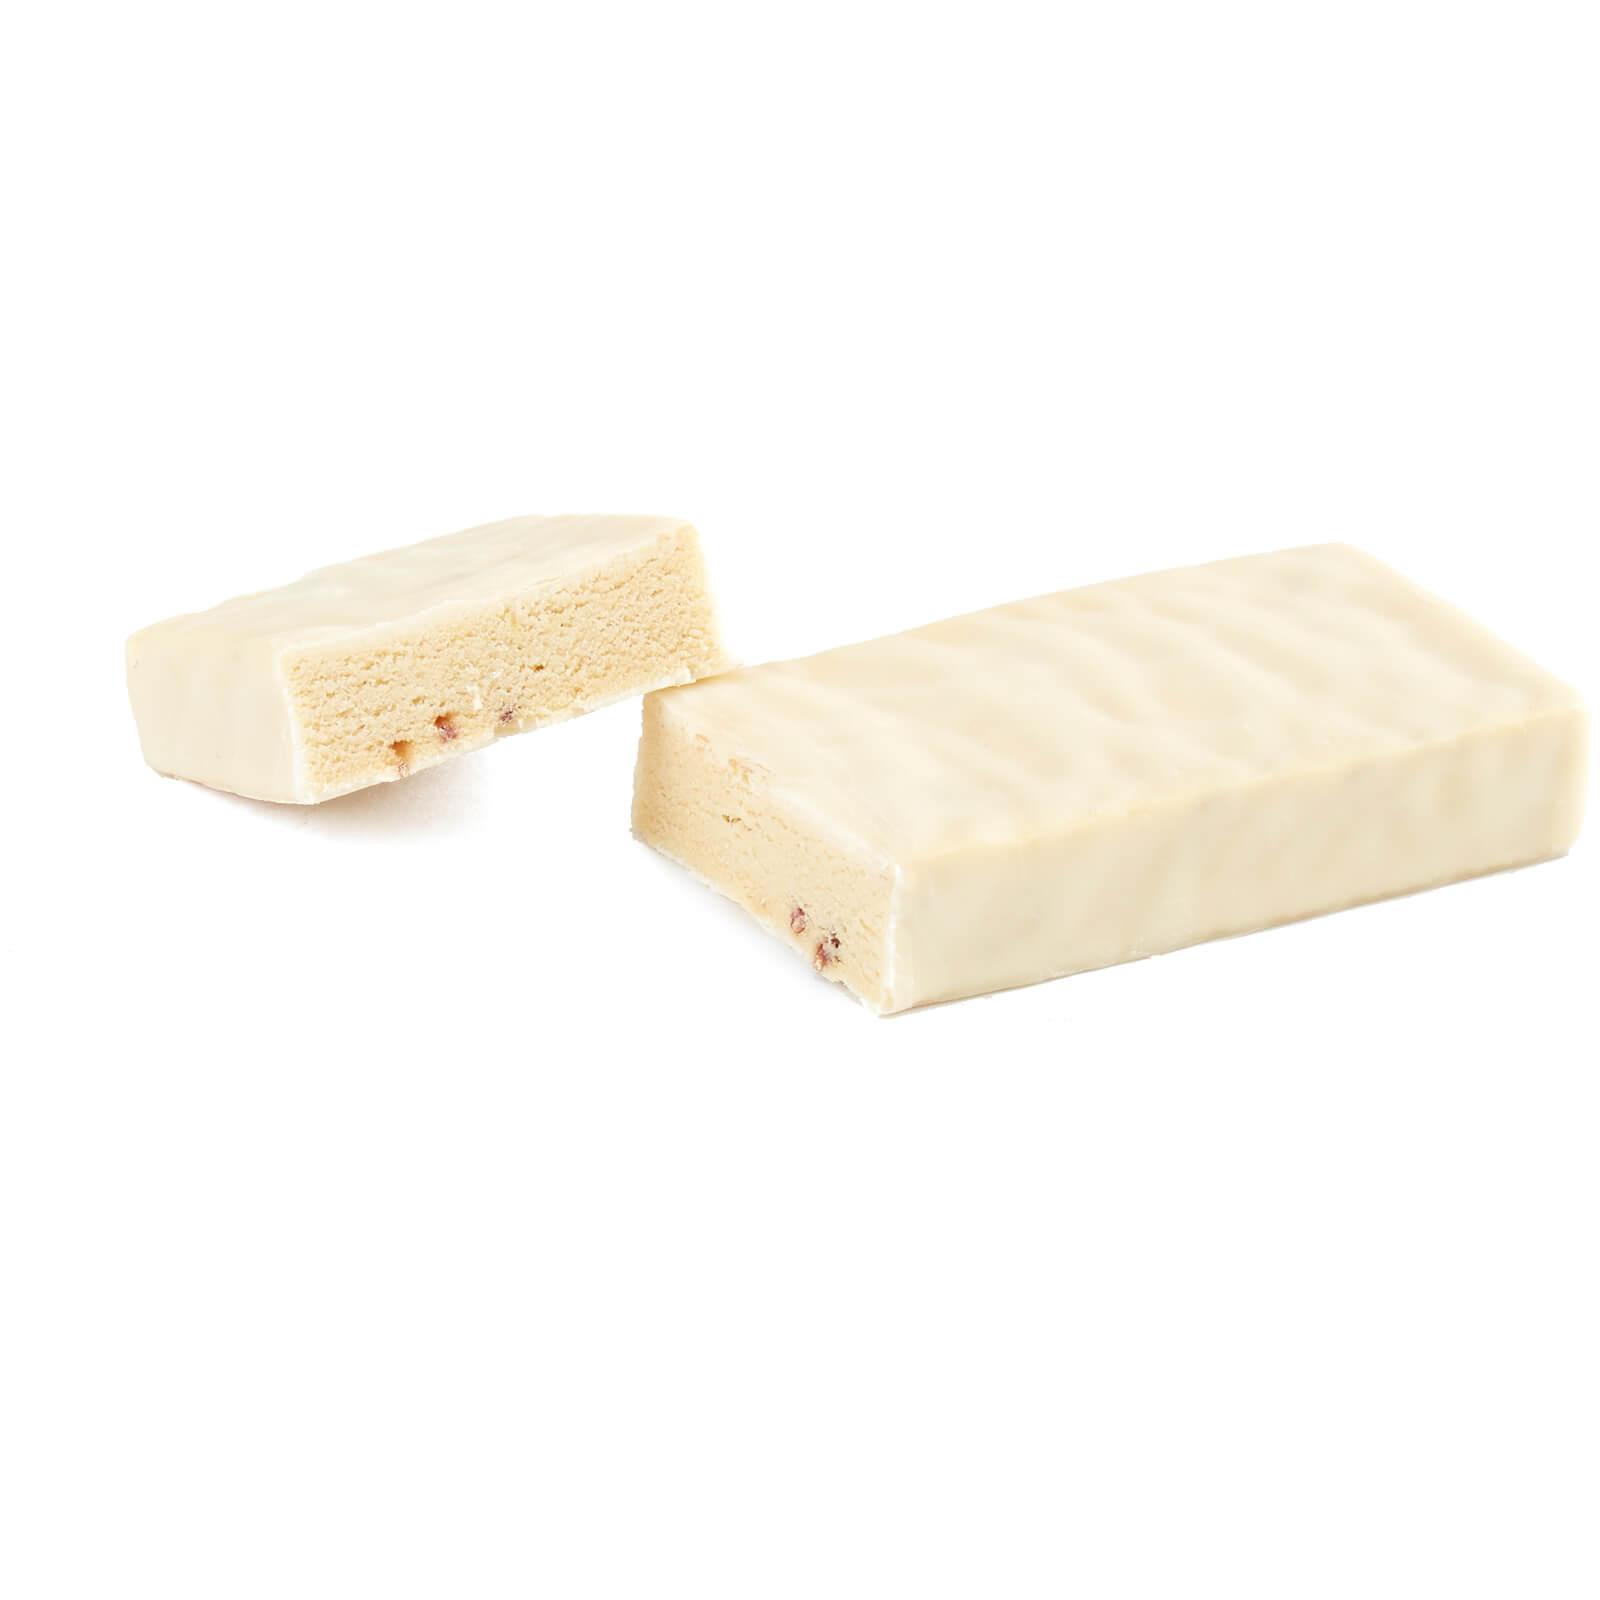 Barre protéinée allégée (Échantillon) - 45g - White Chocolate and Raspberry